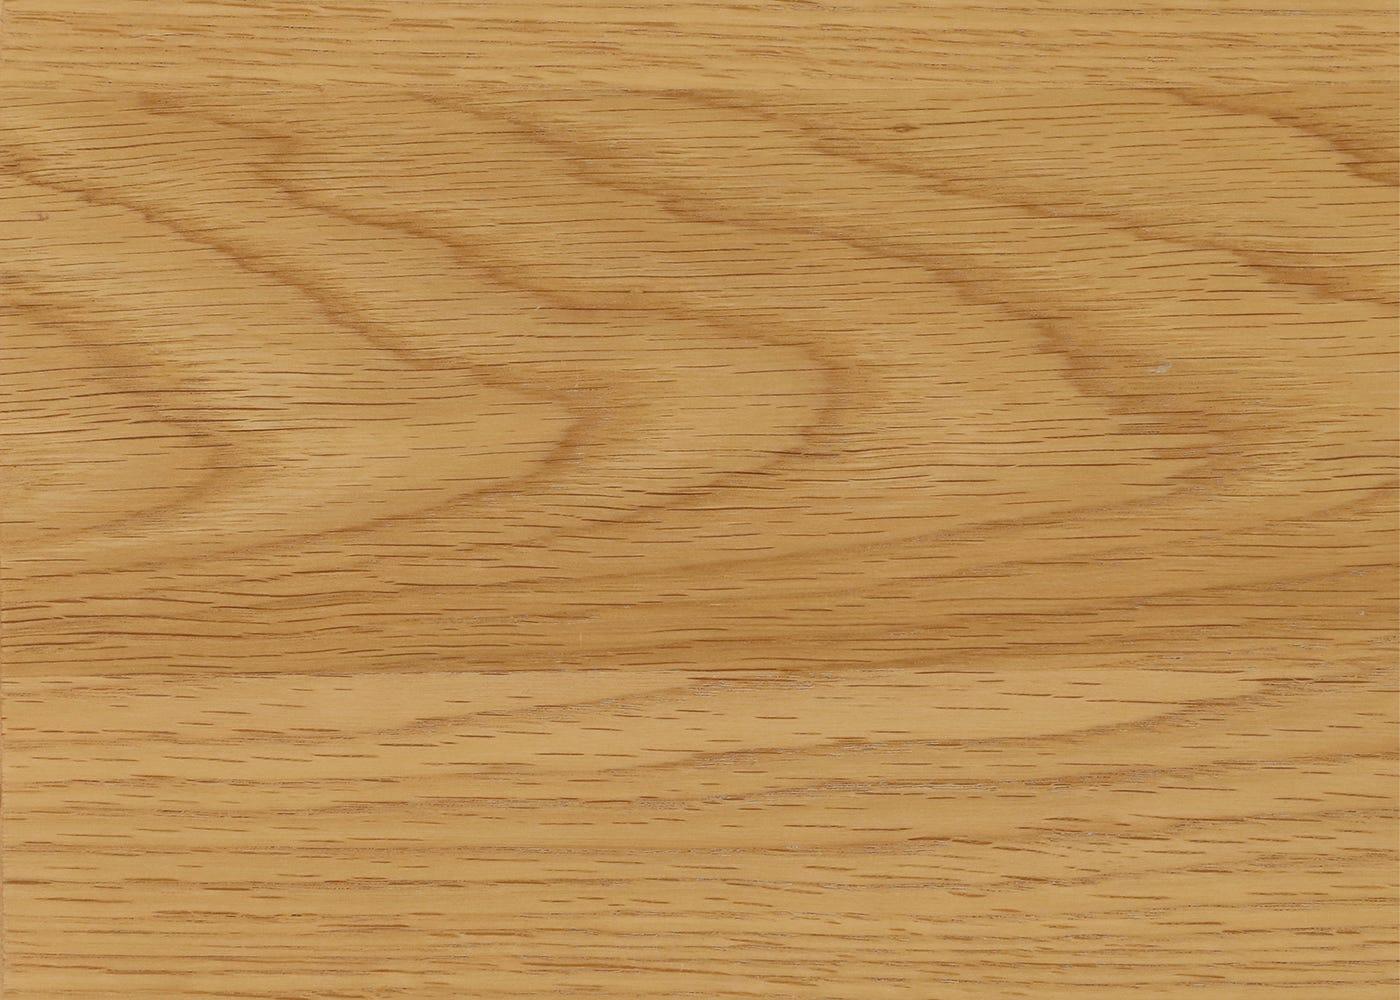 Teramo Bed - Wood Finnish